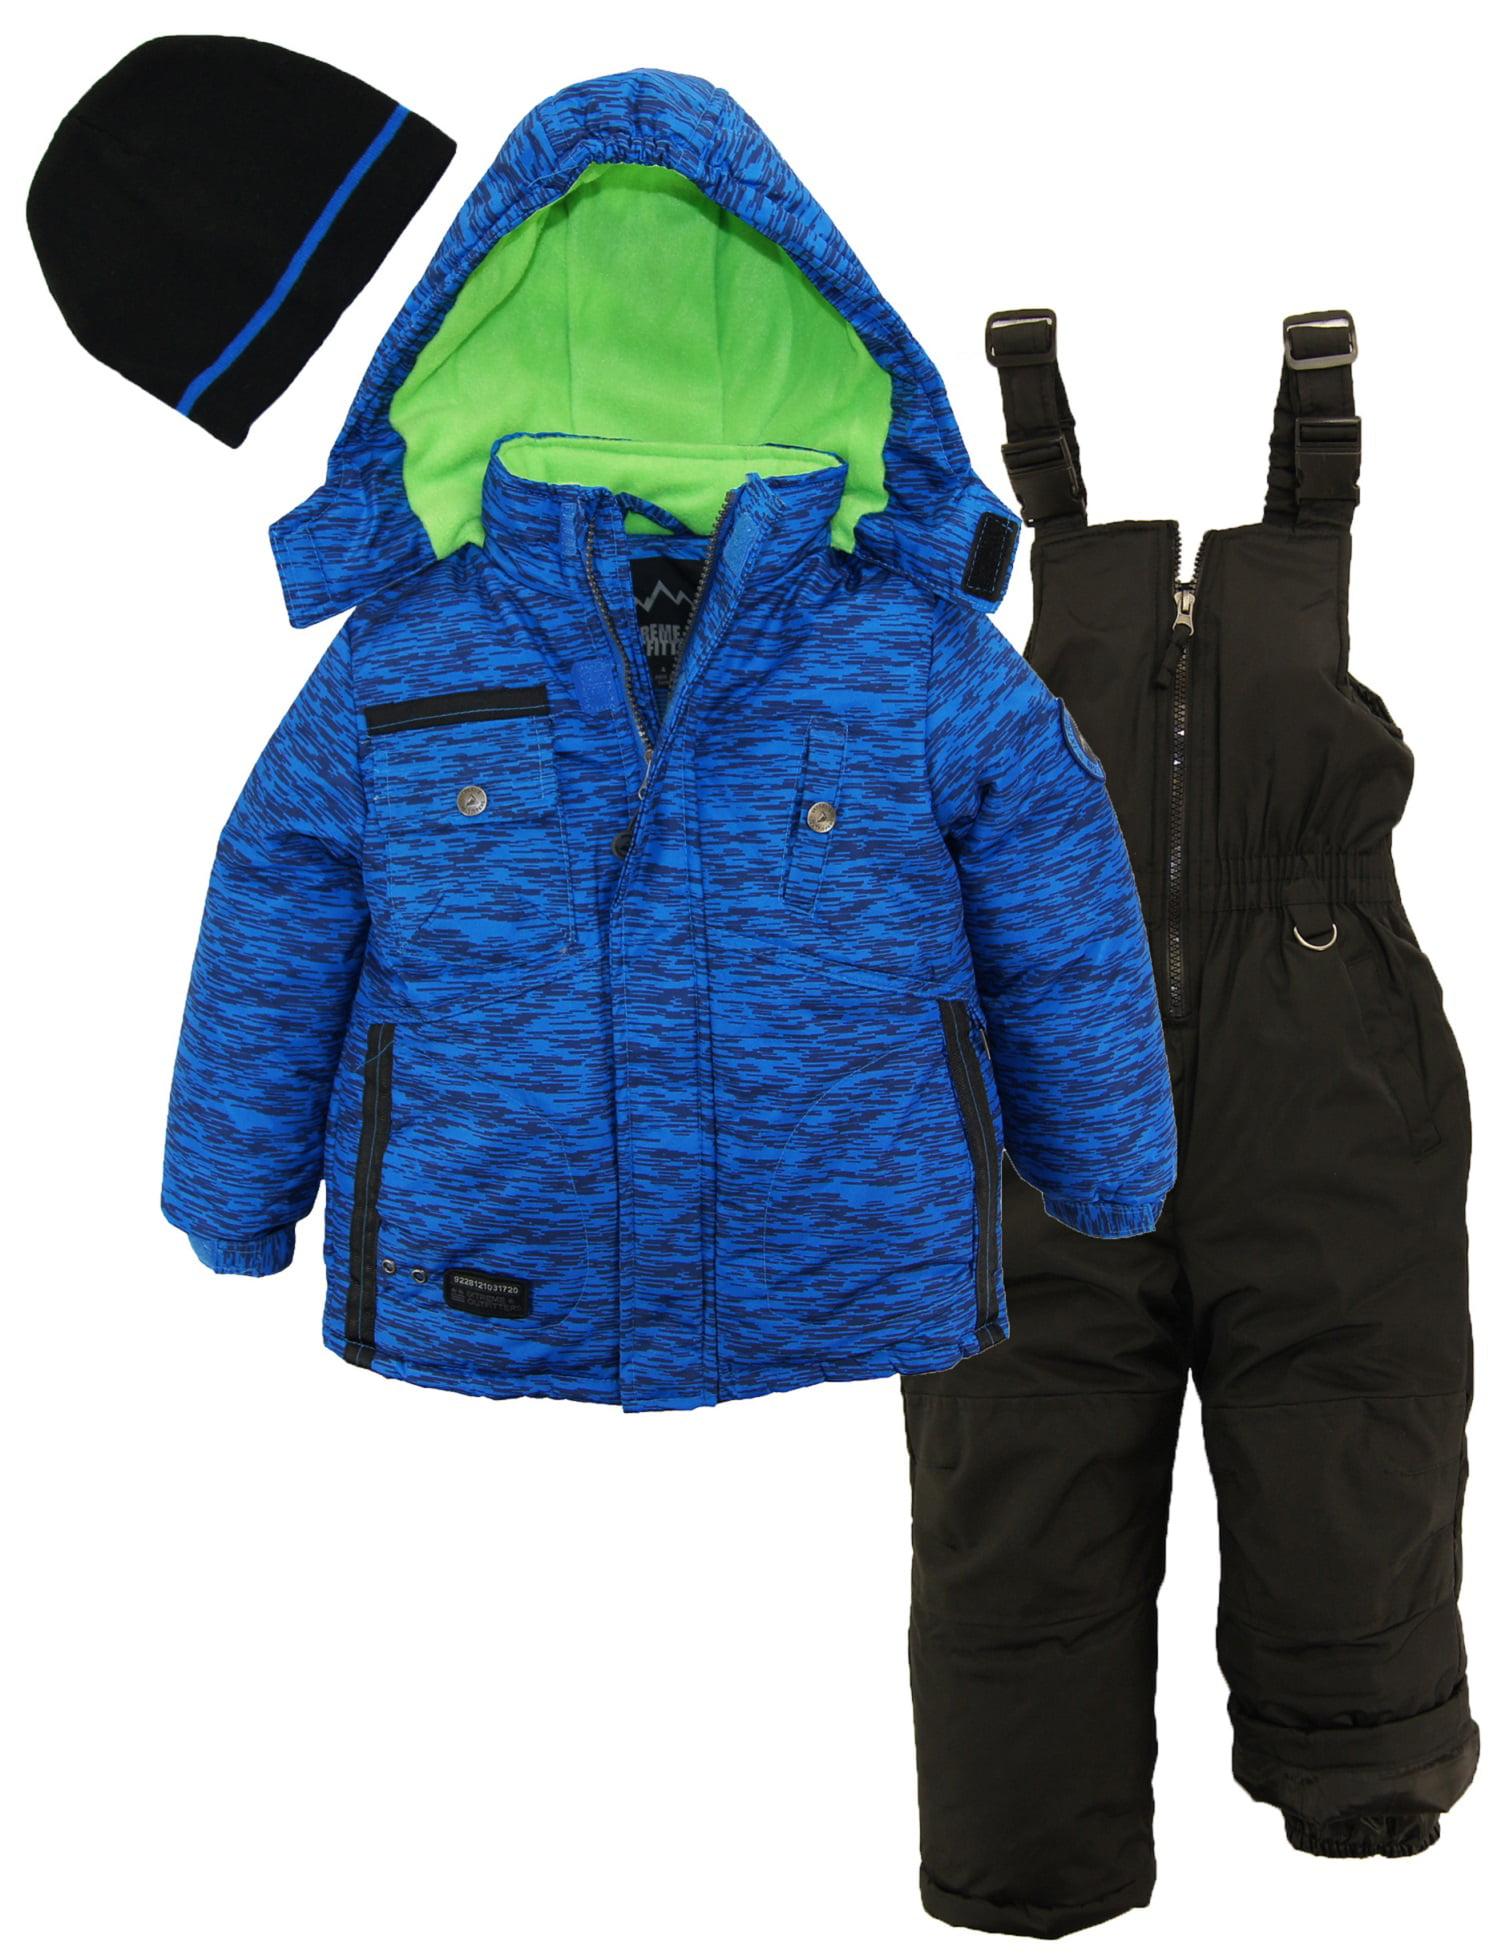 ee0559dc27b9 ixtreme - ixtreme toddler boys colorblock heavy snowsuit winter ski ...